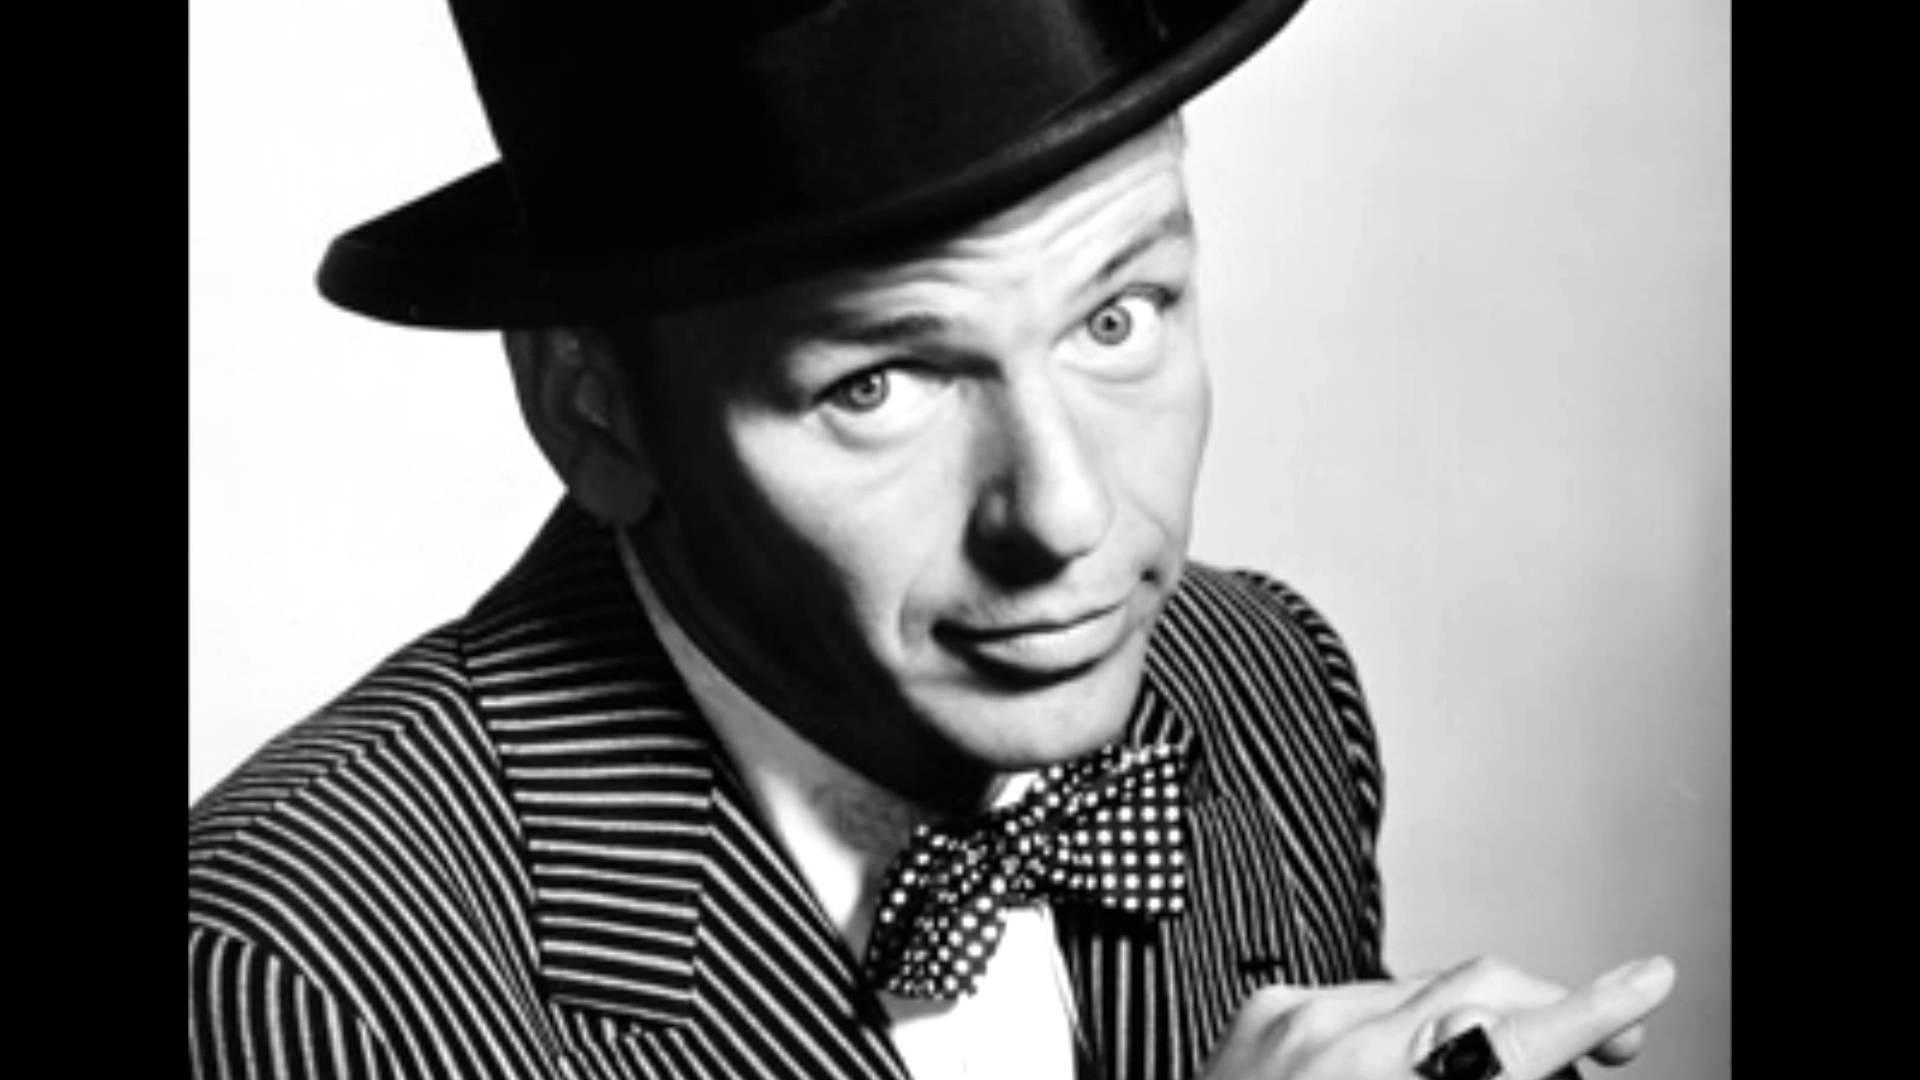 Frank Sinatra - Santa Claus is coming to town (Lyrics Video) - Christmas Song